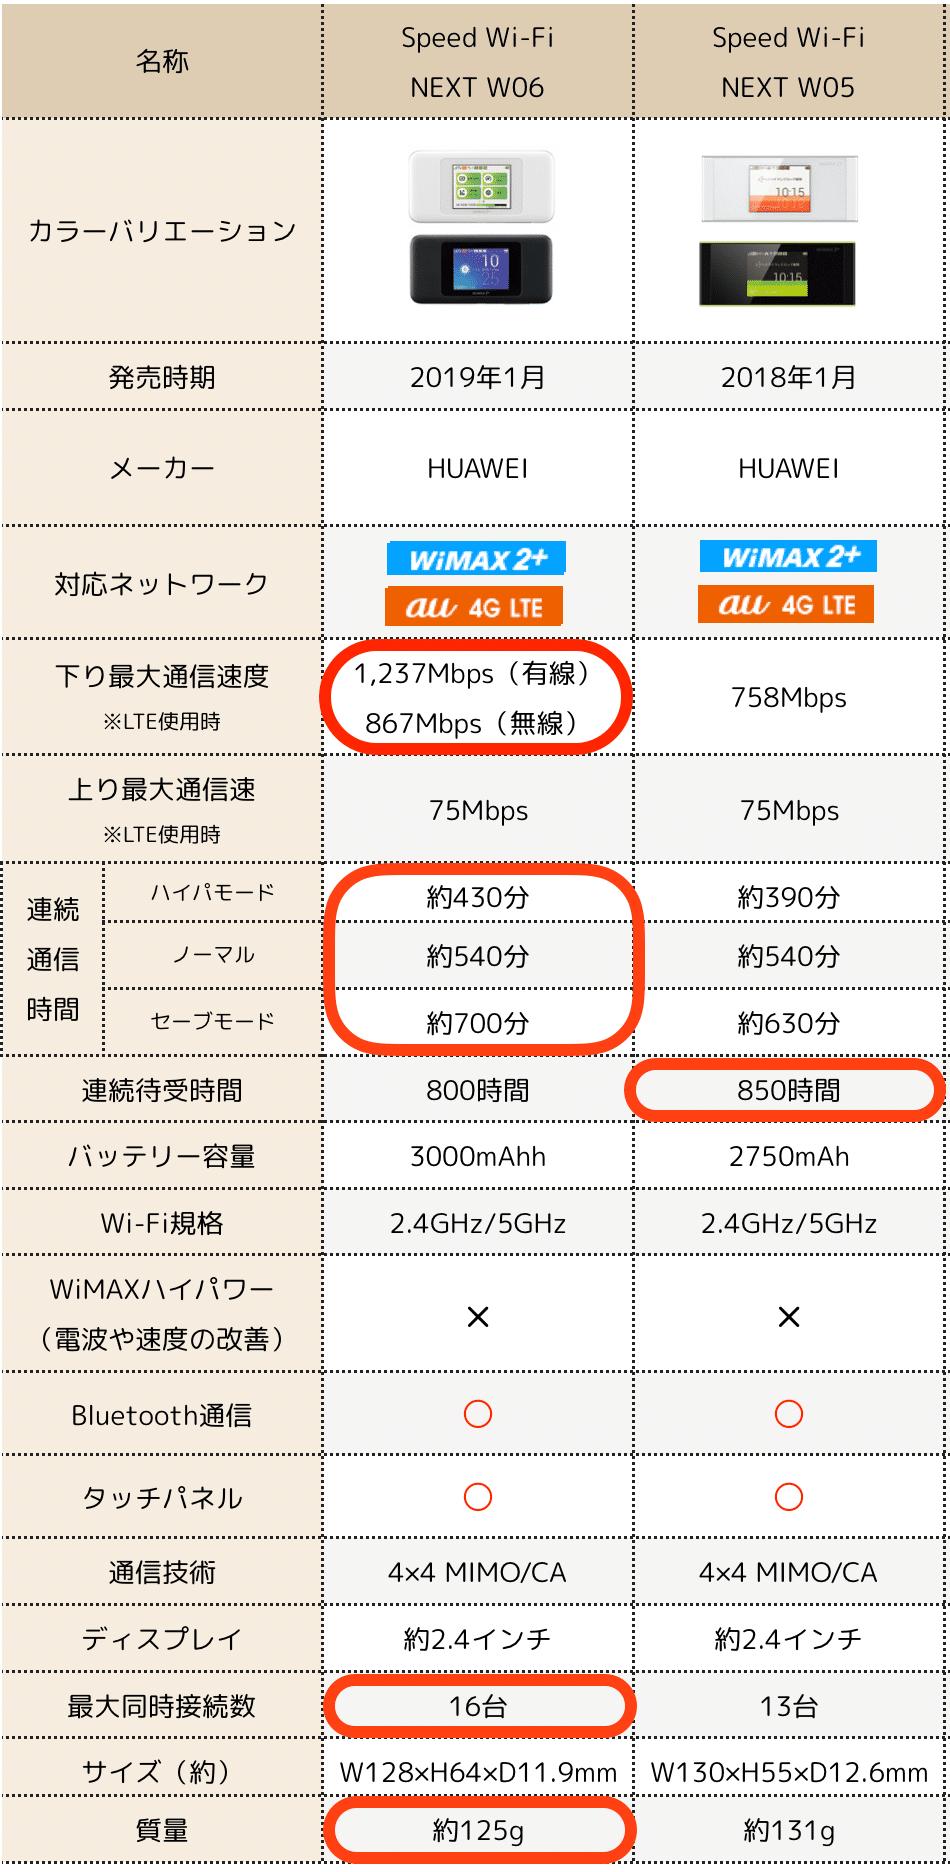 Speed Wi-Fi NEXT W06とW05のスペック比較表